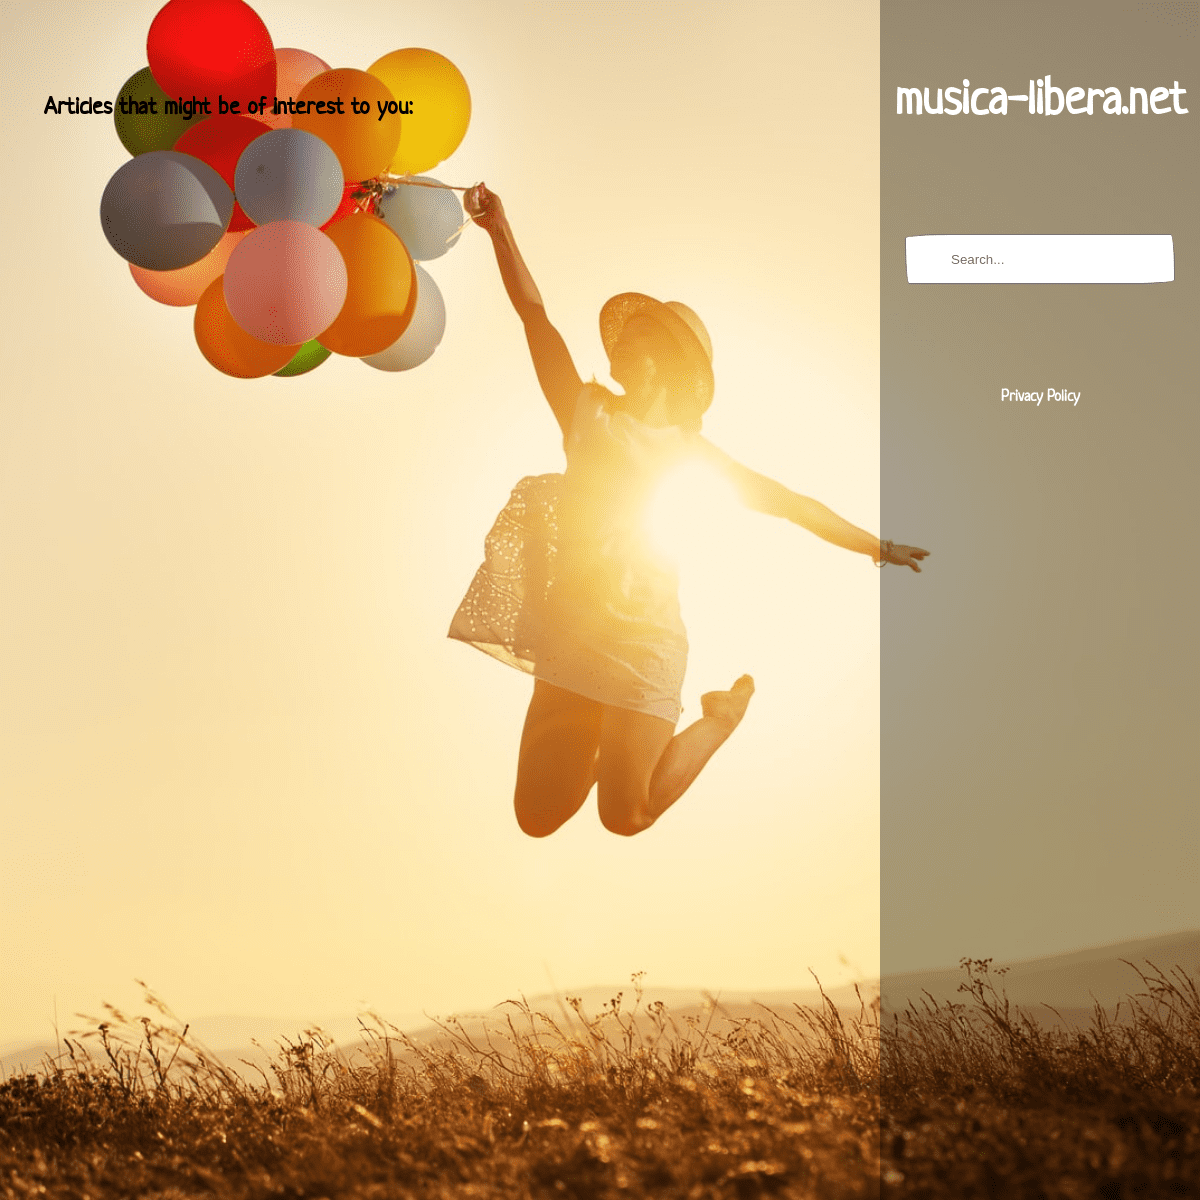 musica-libera.net